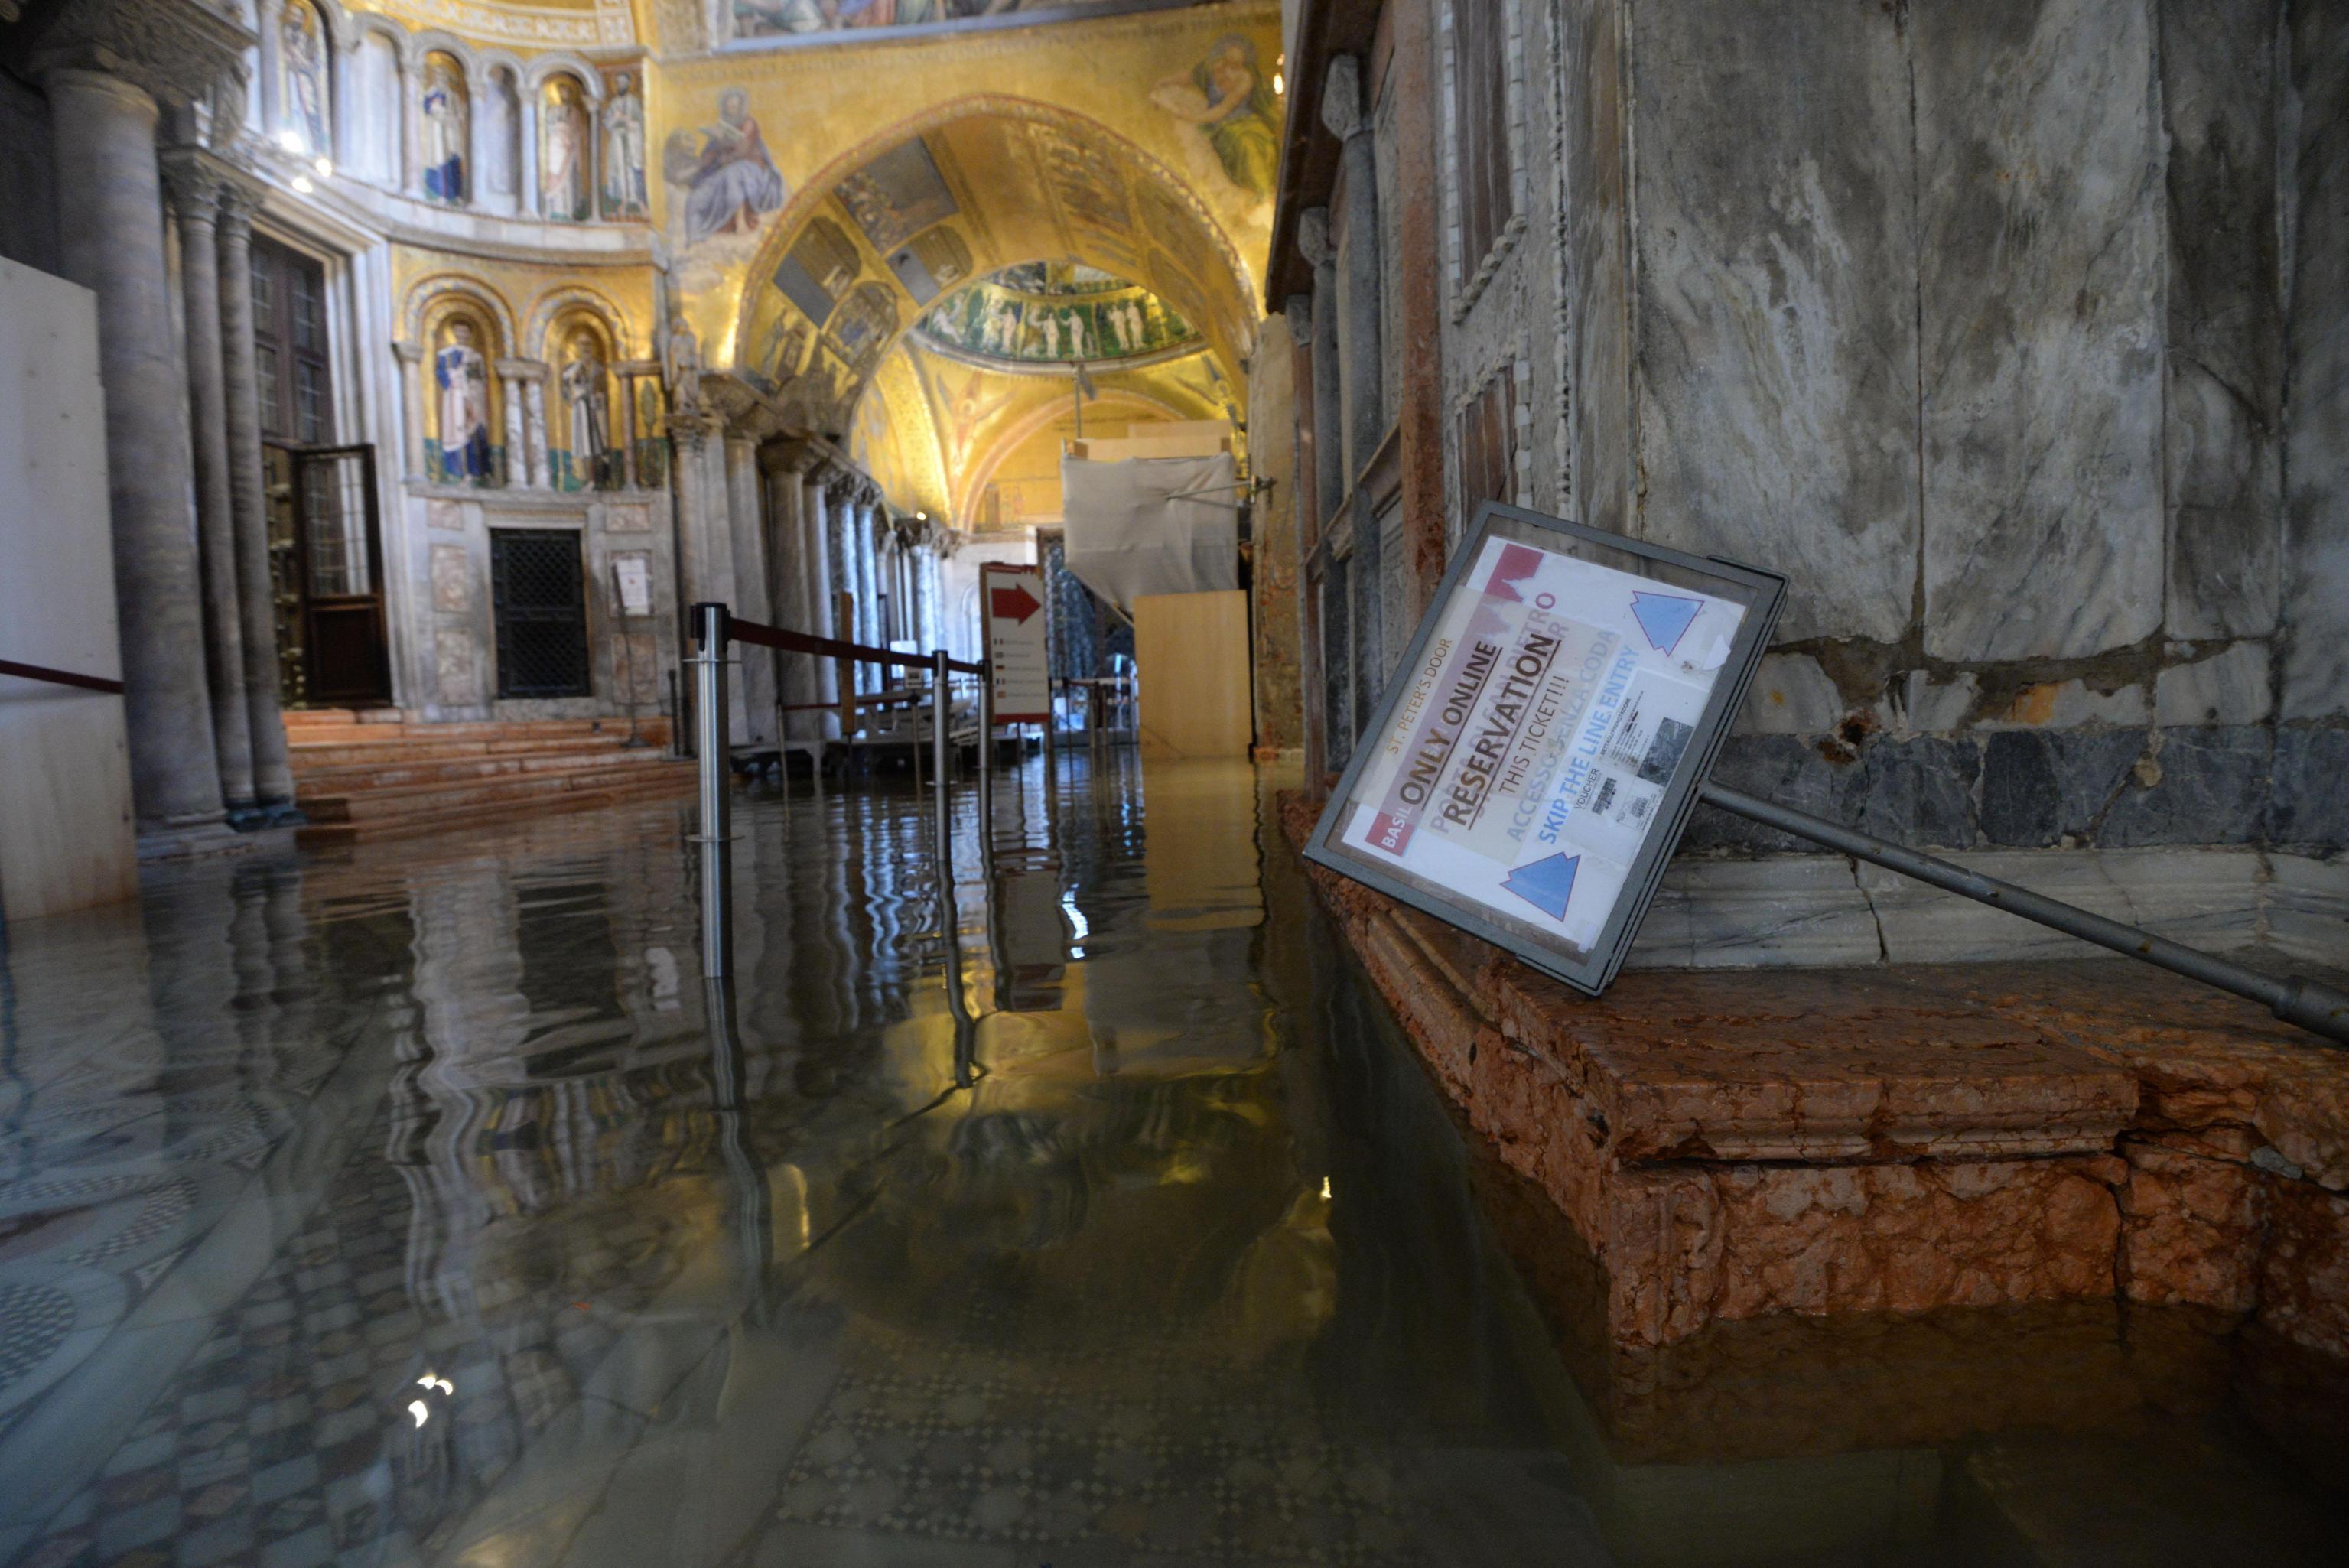 FOTO Cambio climático, causa de marea récord en Venecia, dice alcalde